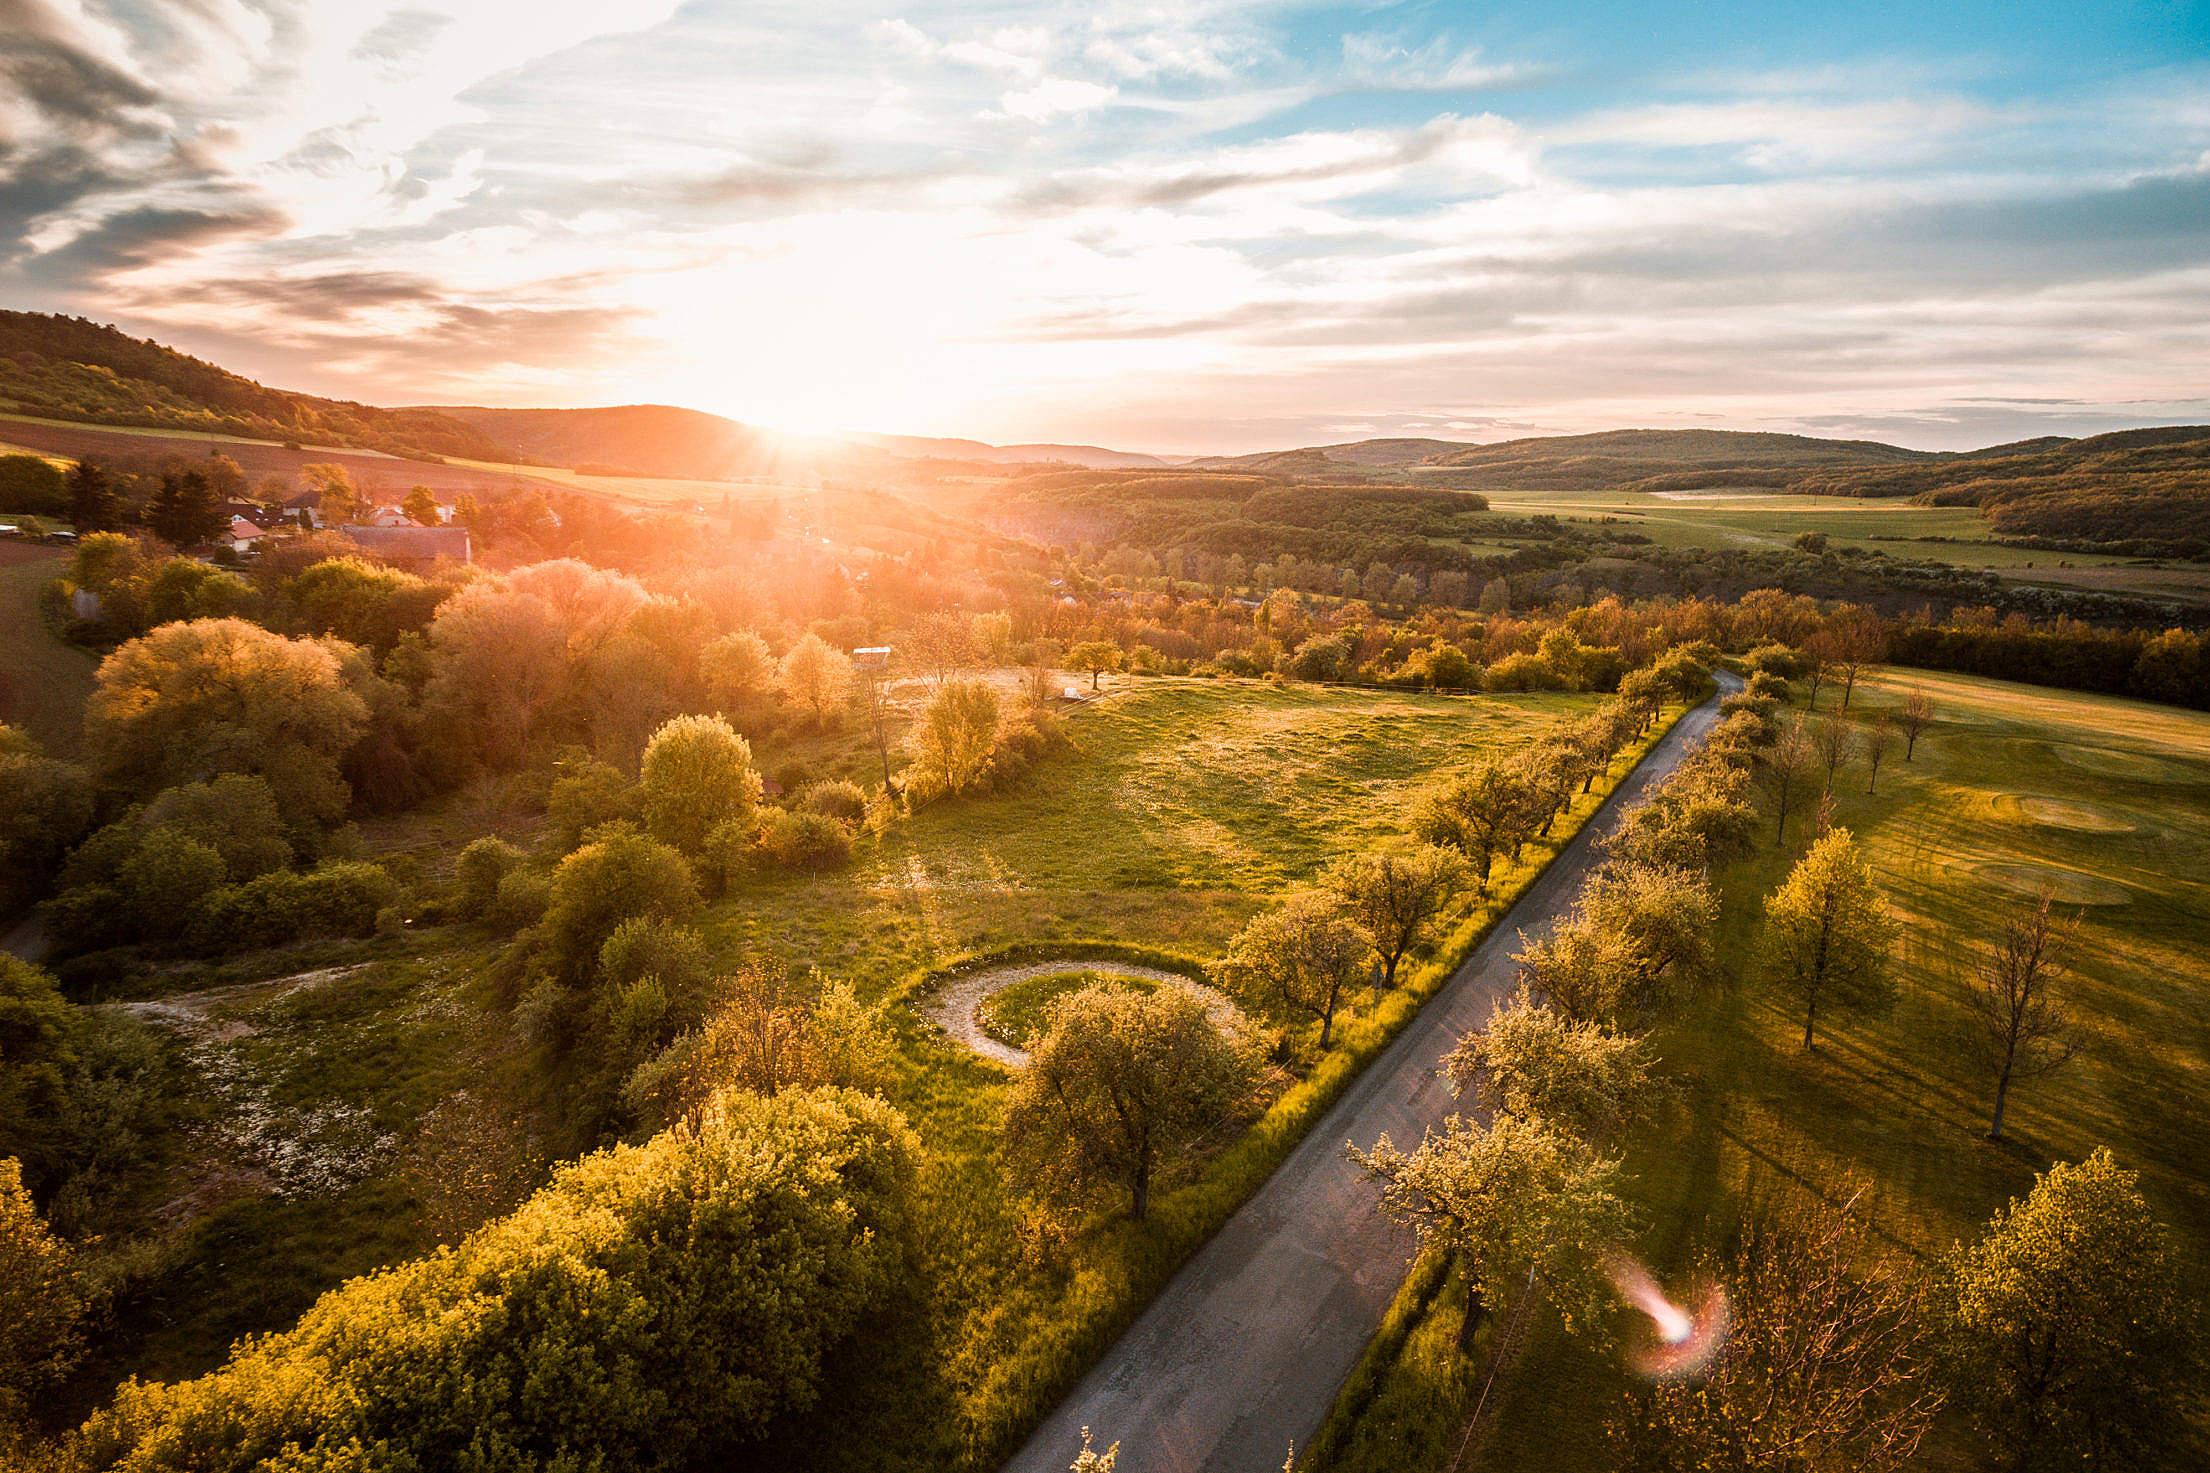 Beautiful Sunset Over Hills Free Stock Photo